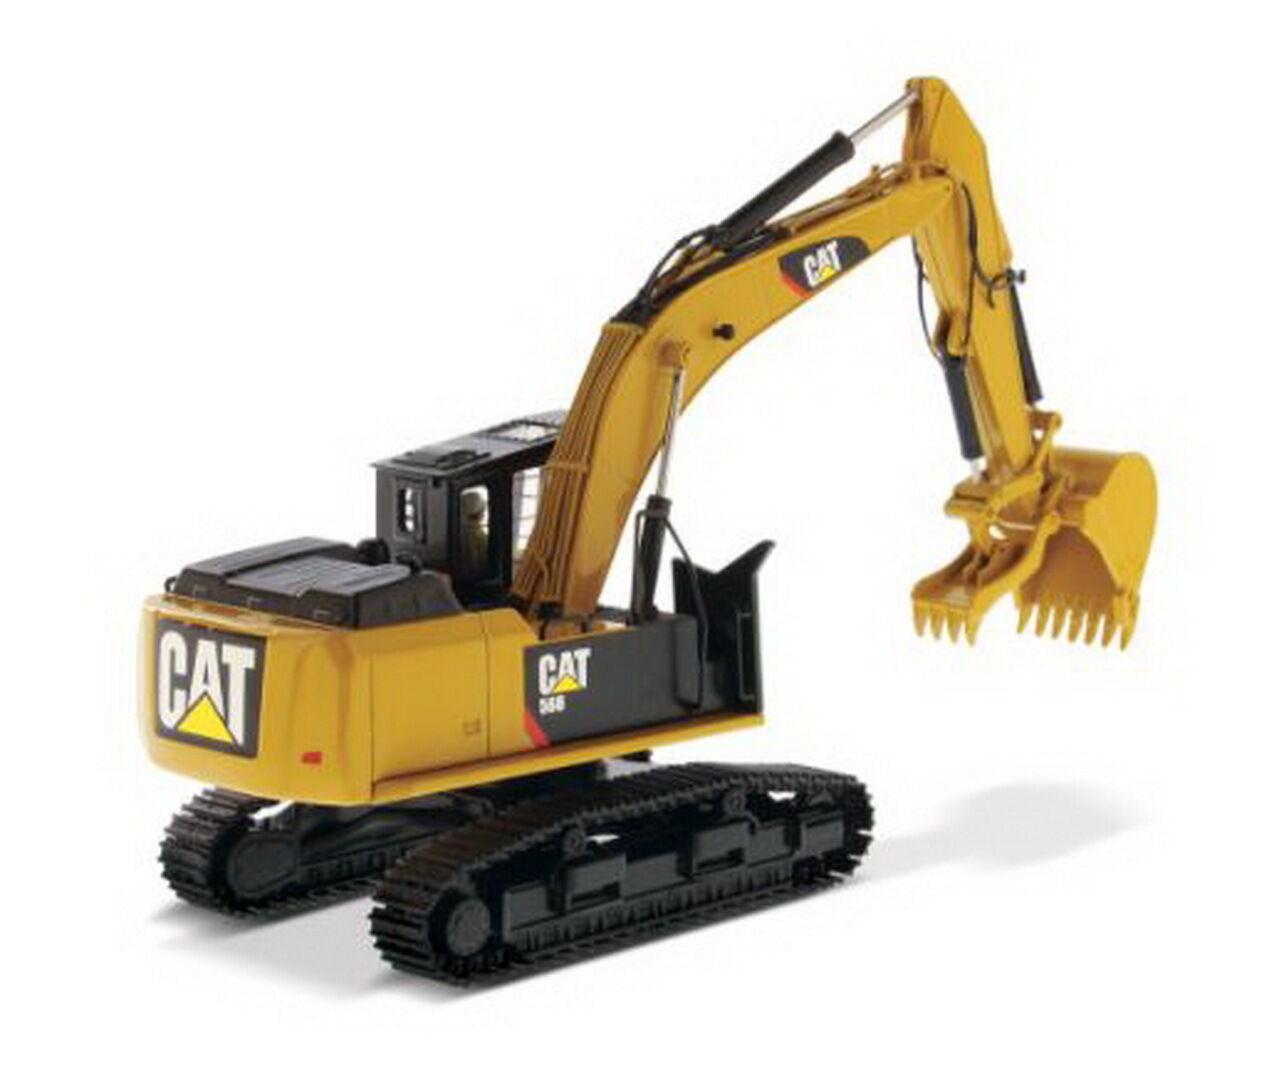 1/50 dm Caterpillar Cat 568 Modelo Diecast configuración constructor de carretera 85923